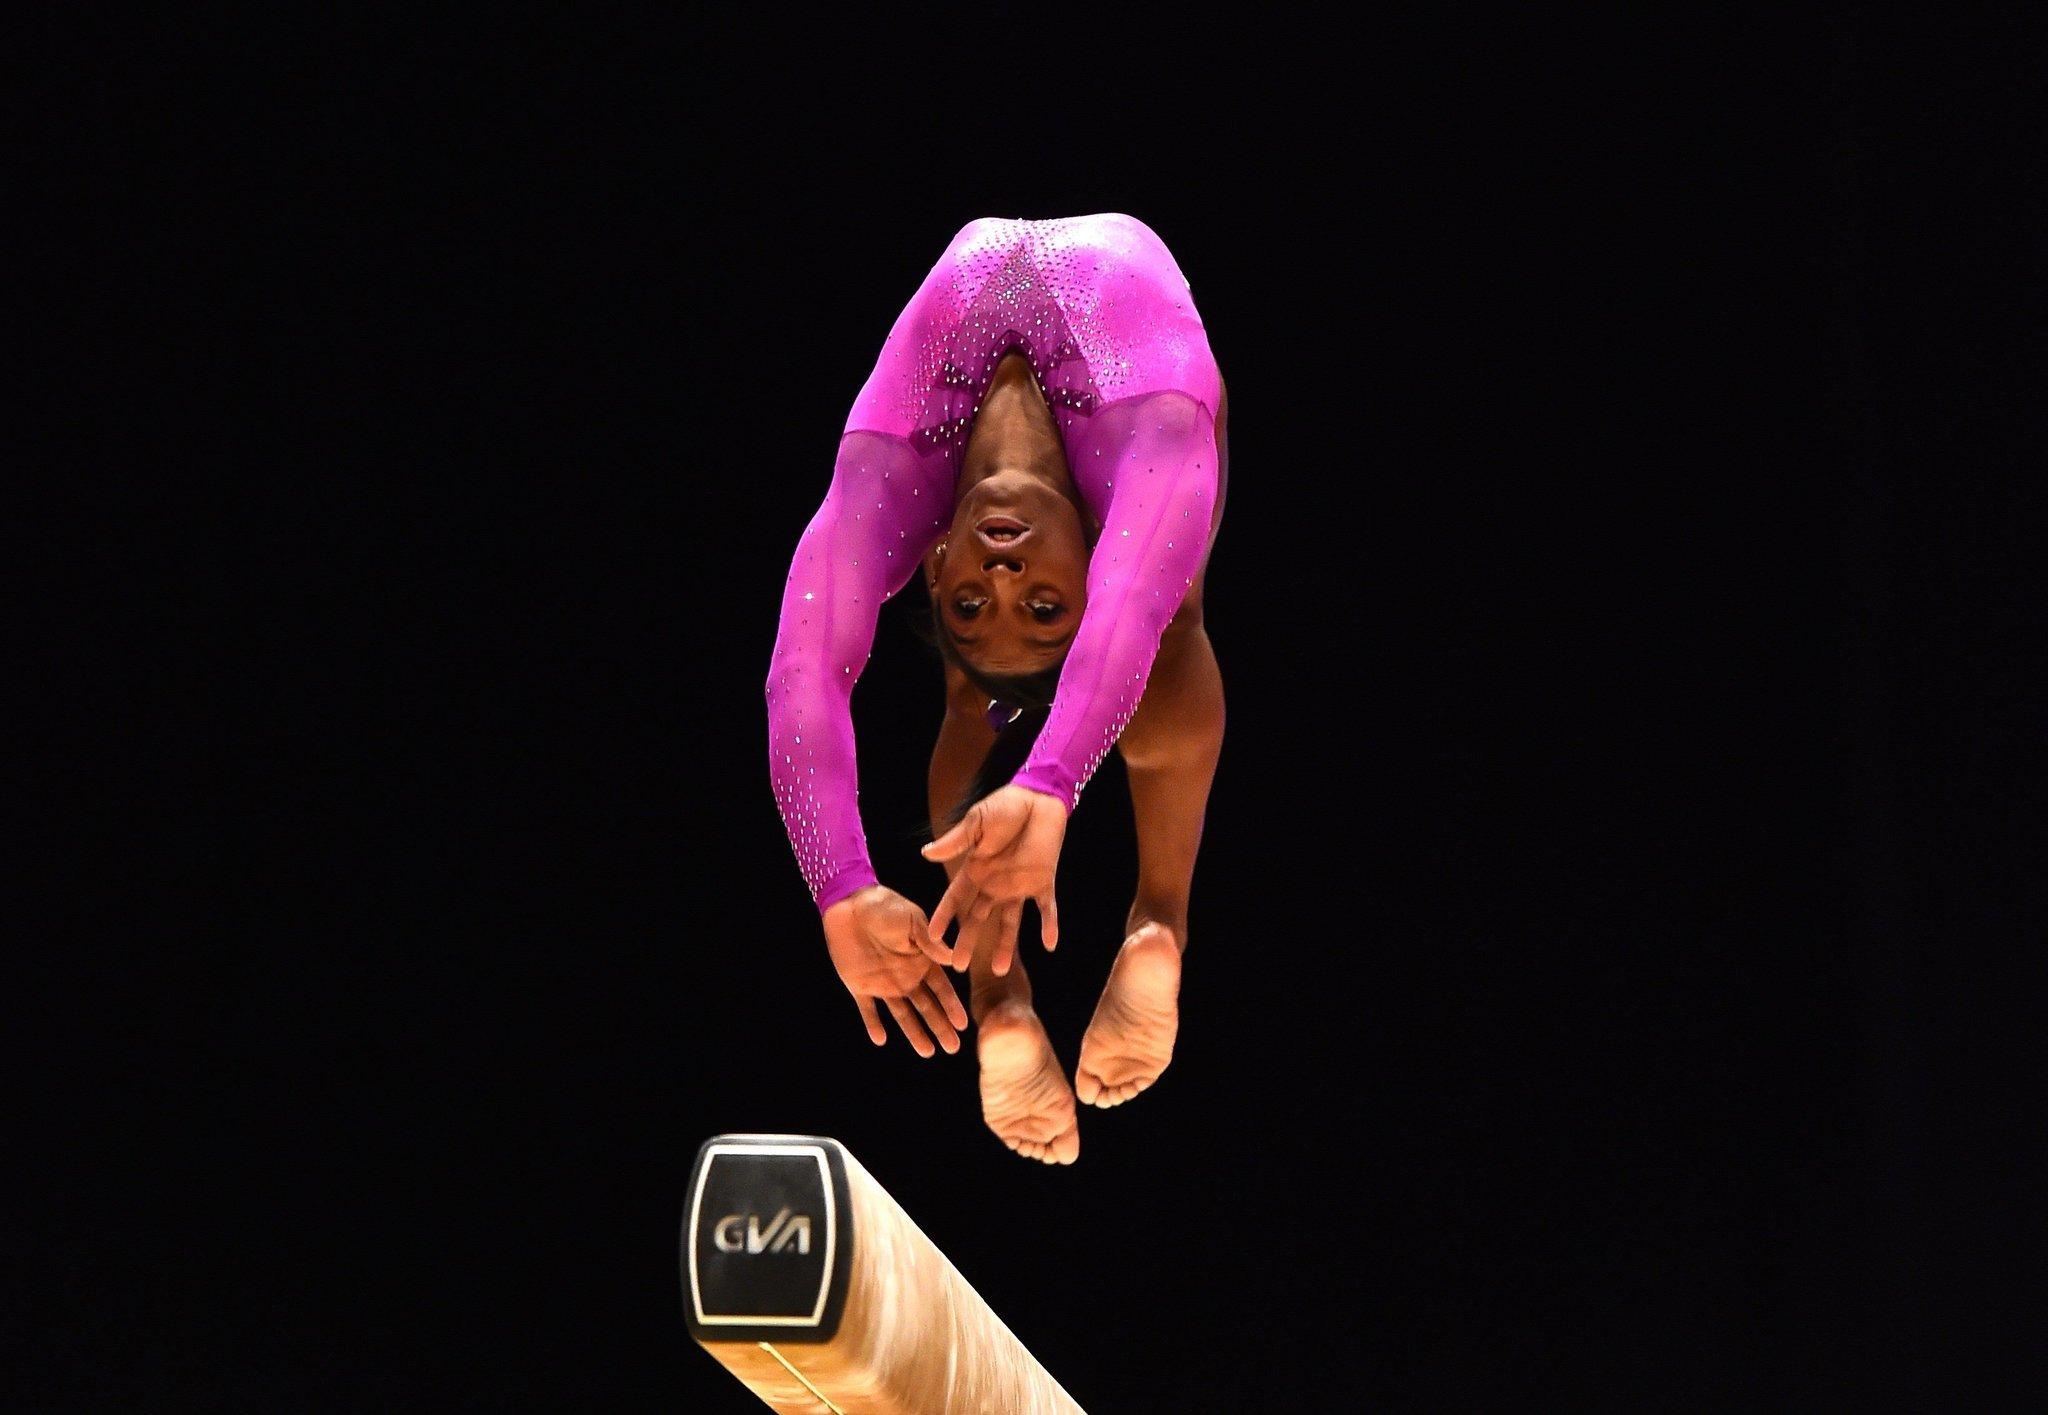 Simone Biles earns record 10th world championship gold